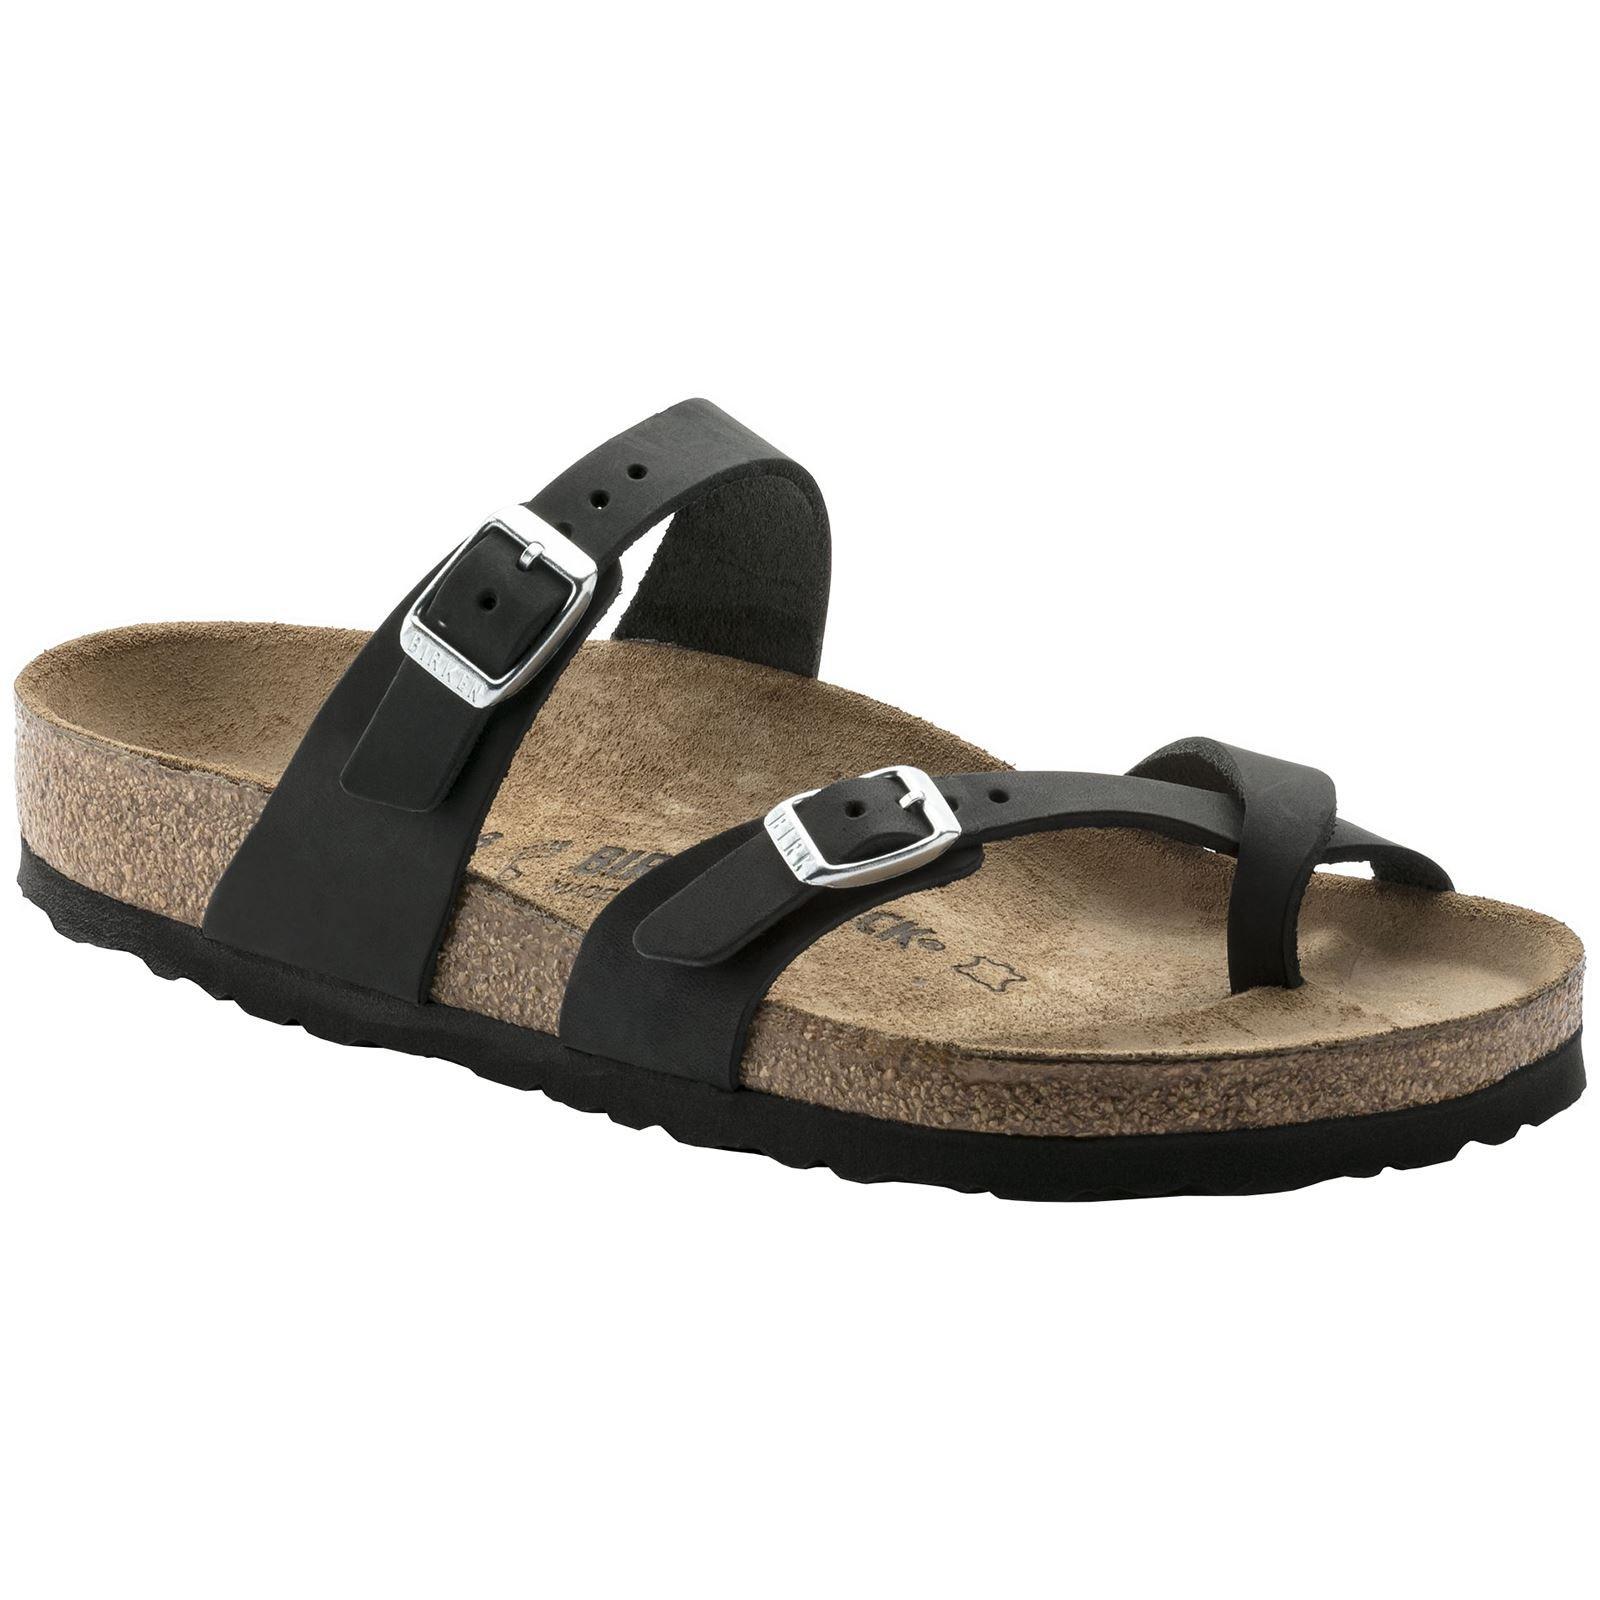 Birkenstock Womens Mayari Black Nubuck Sandals 38 EU by Birkenstock